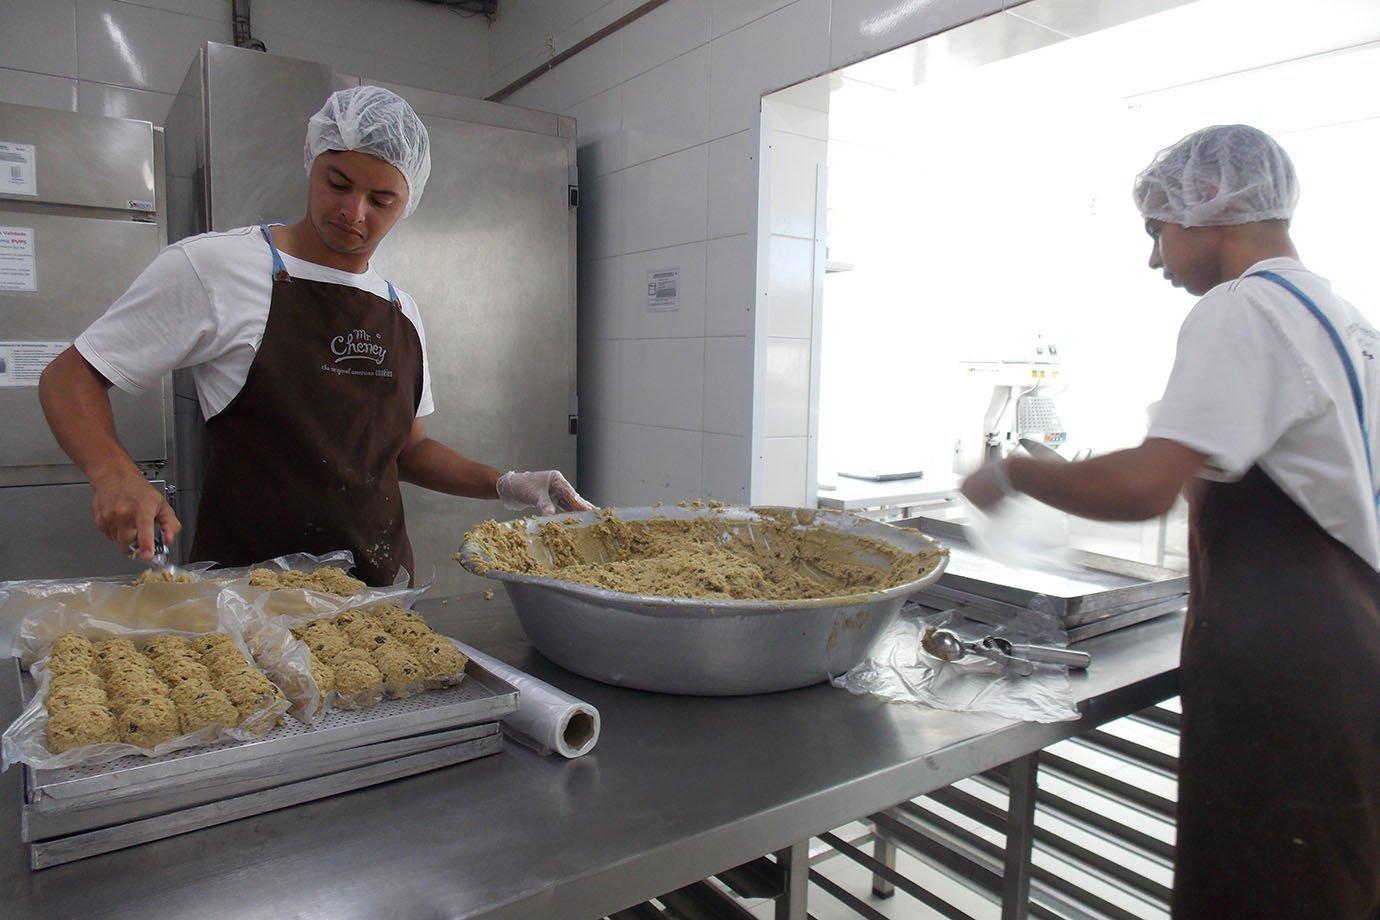 Massa de cookies da Mr. Cheney, na fábrica em São Paulo